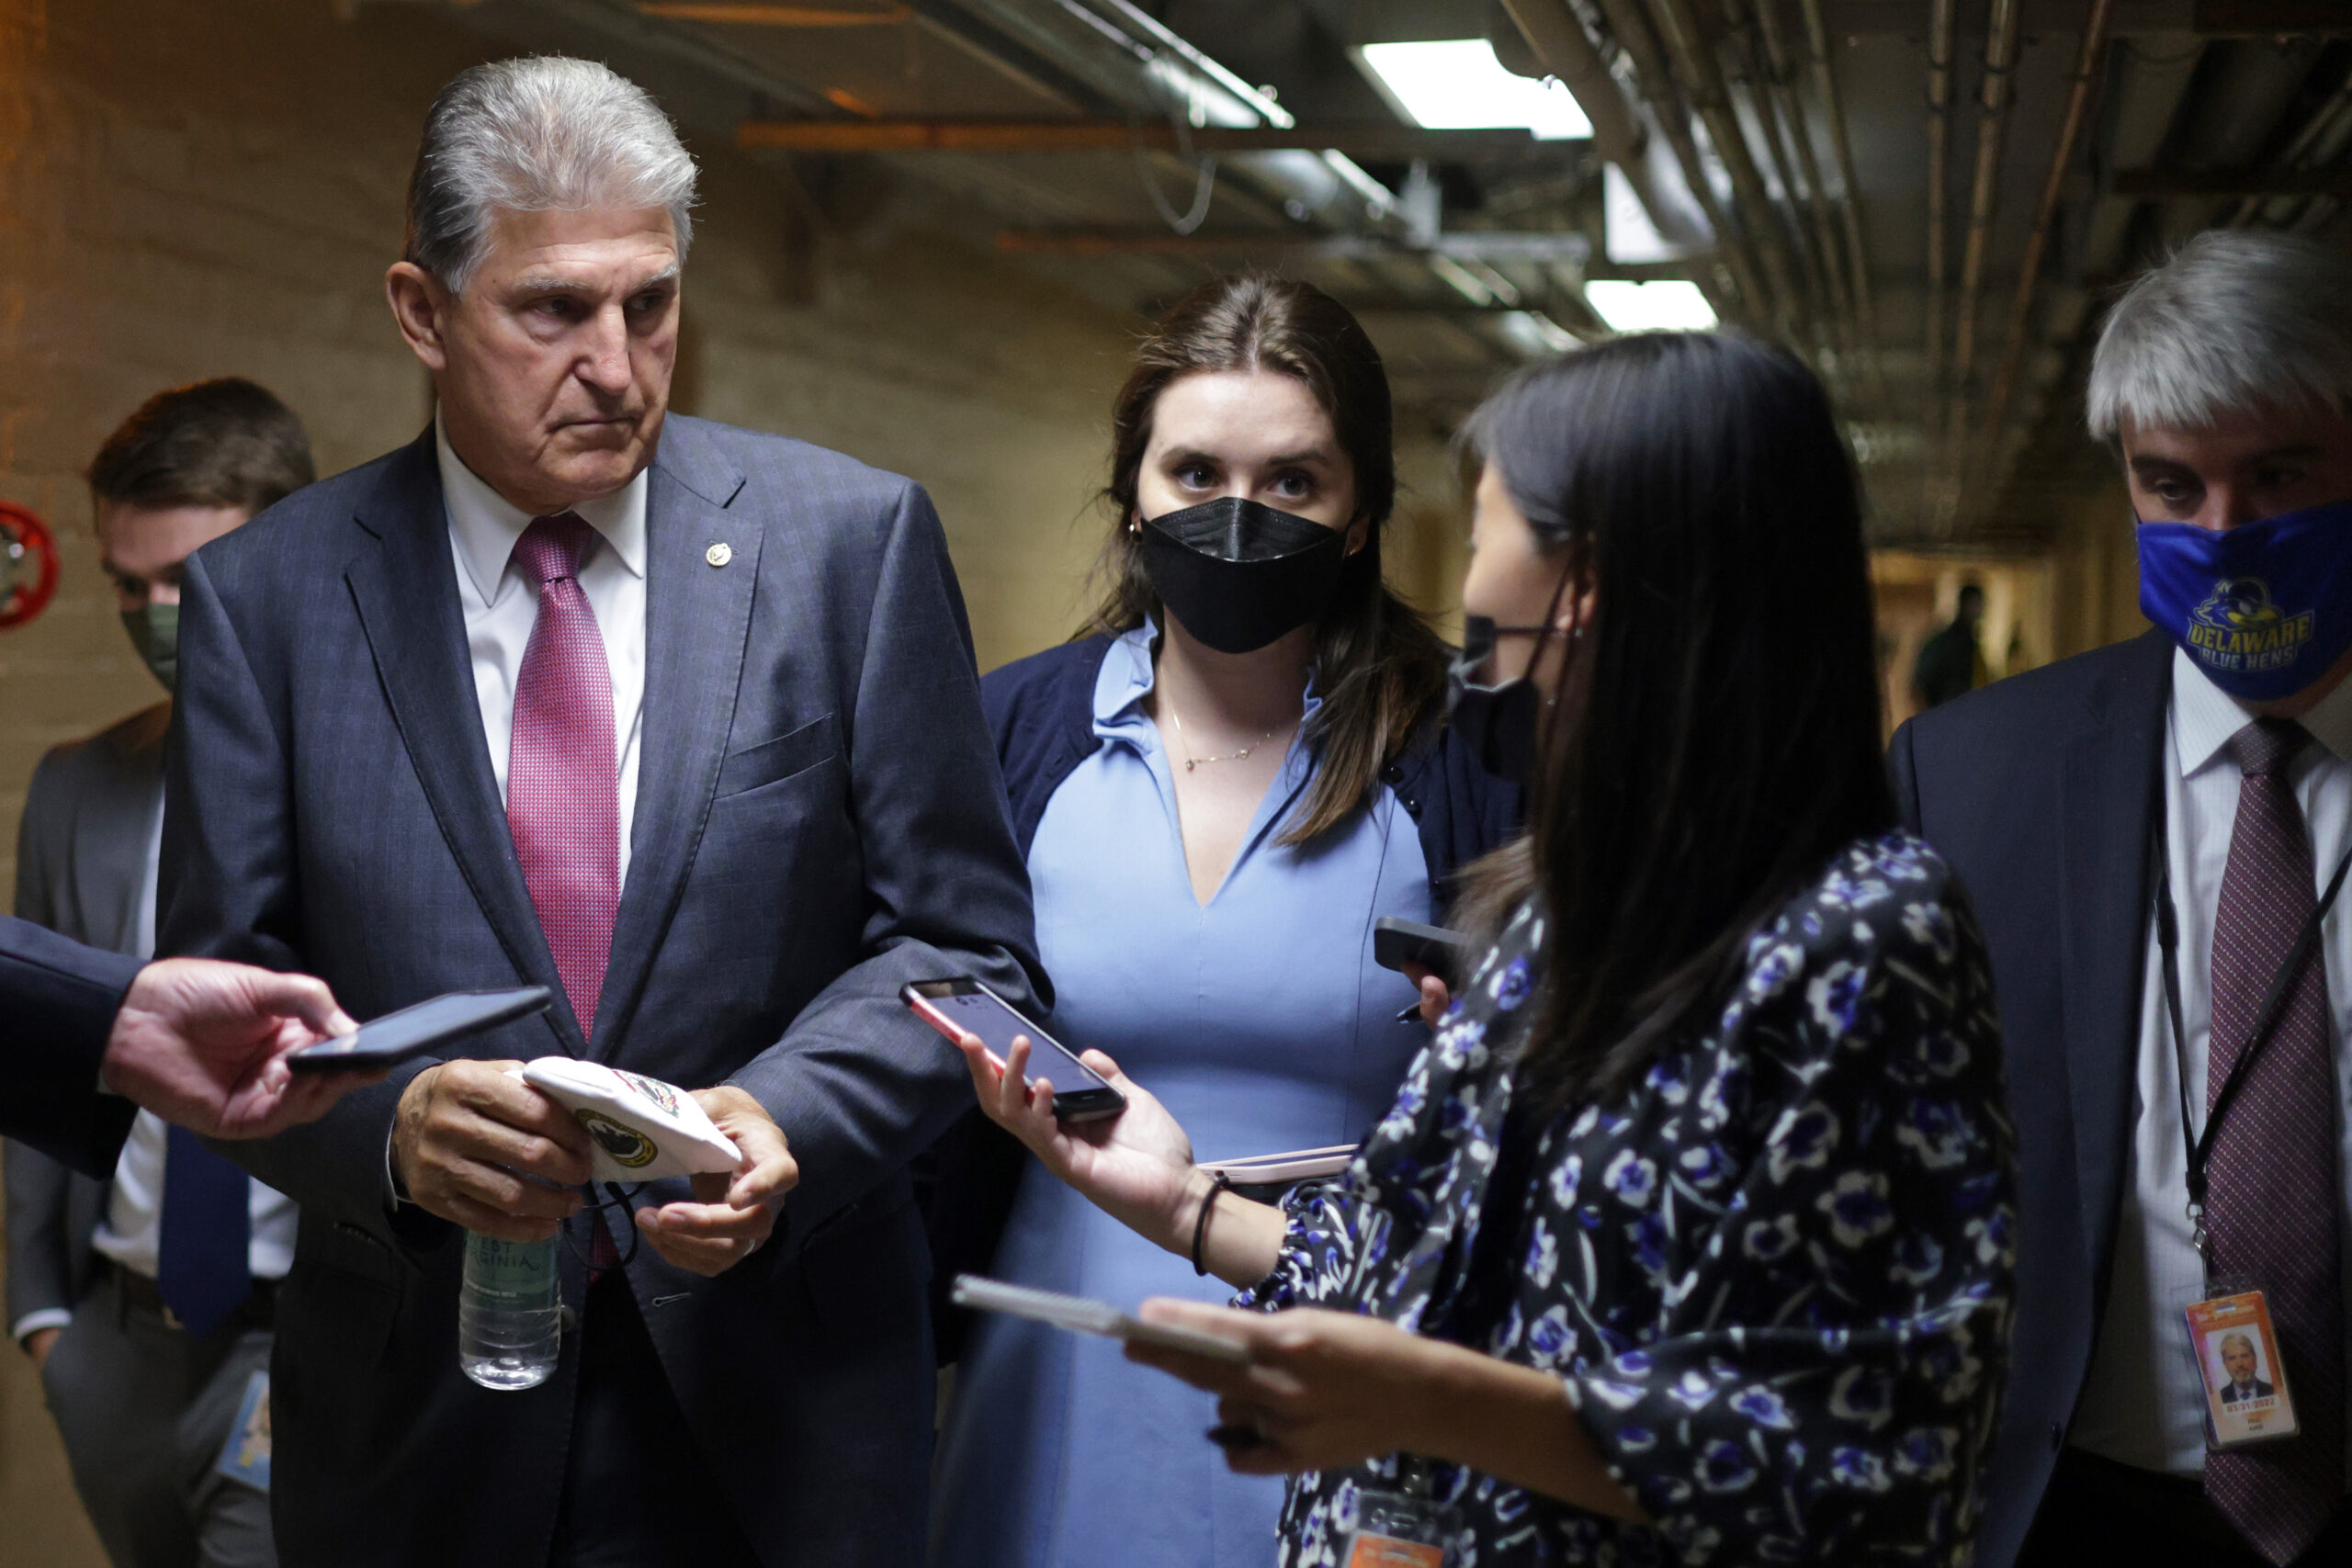 Sen. Joe Manchin (D-W.Va.) talks to members of the press in a hallway at the U.S. Capitol Sept. 28, 2021 in Washington, D.C. Credit: Alex Wong/Getty Images